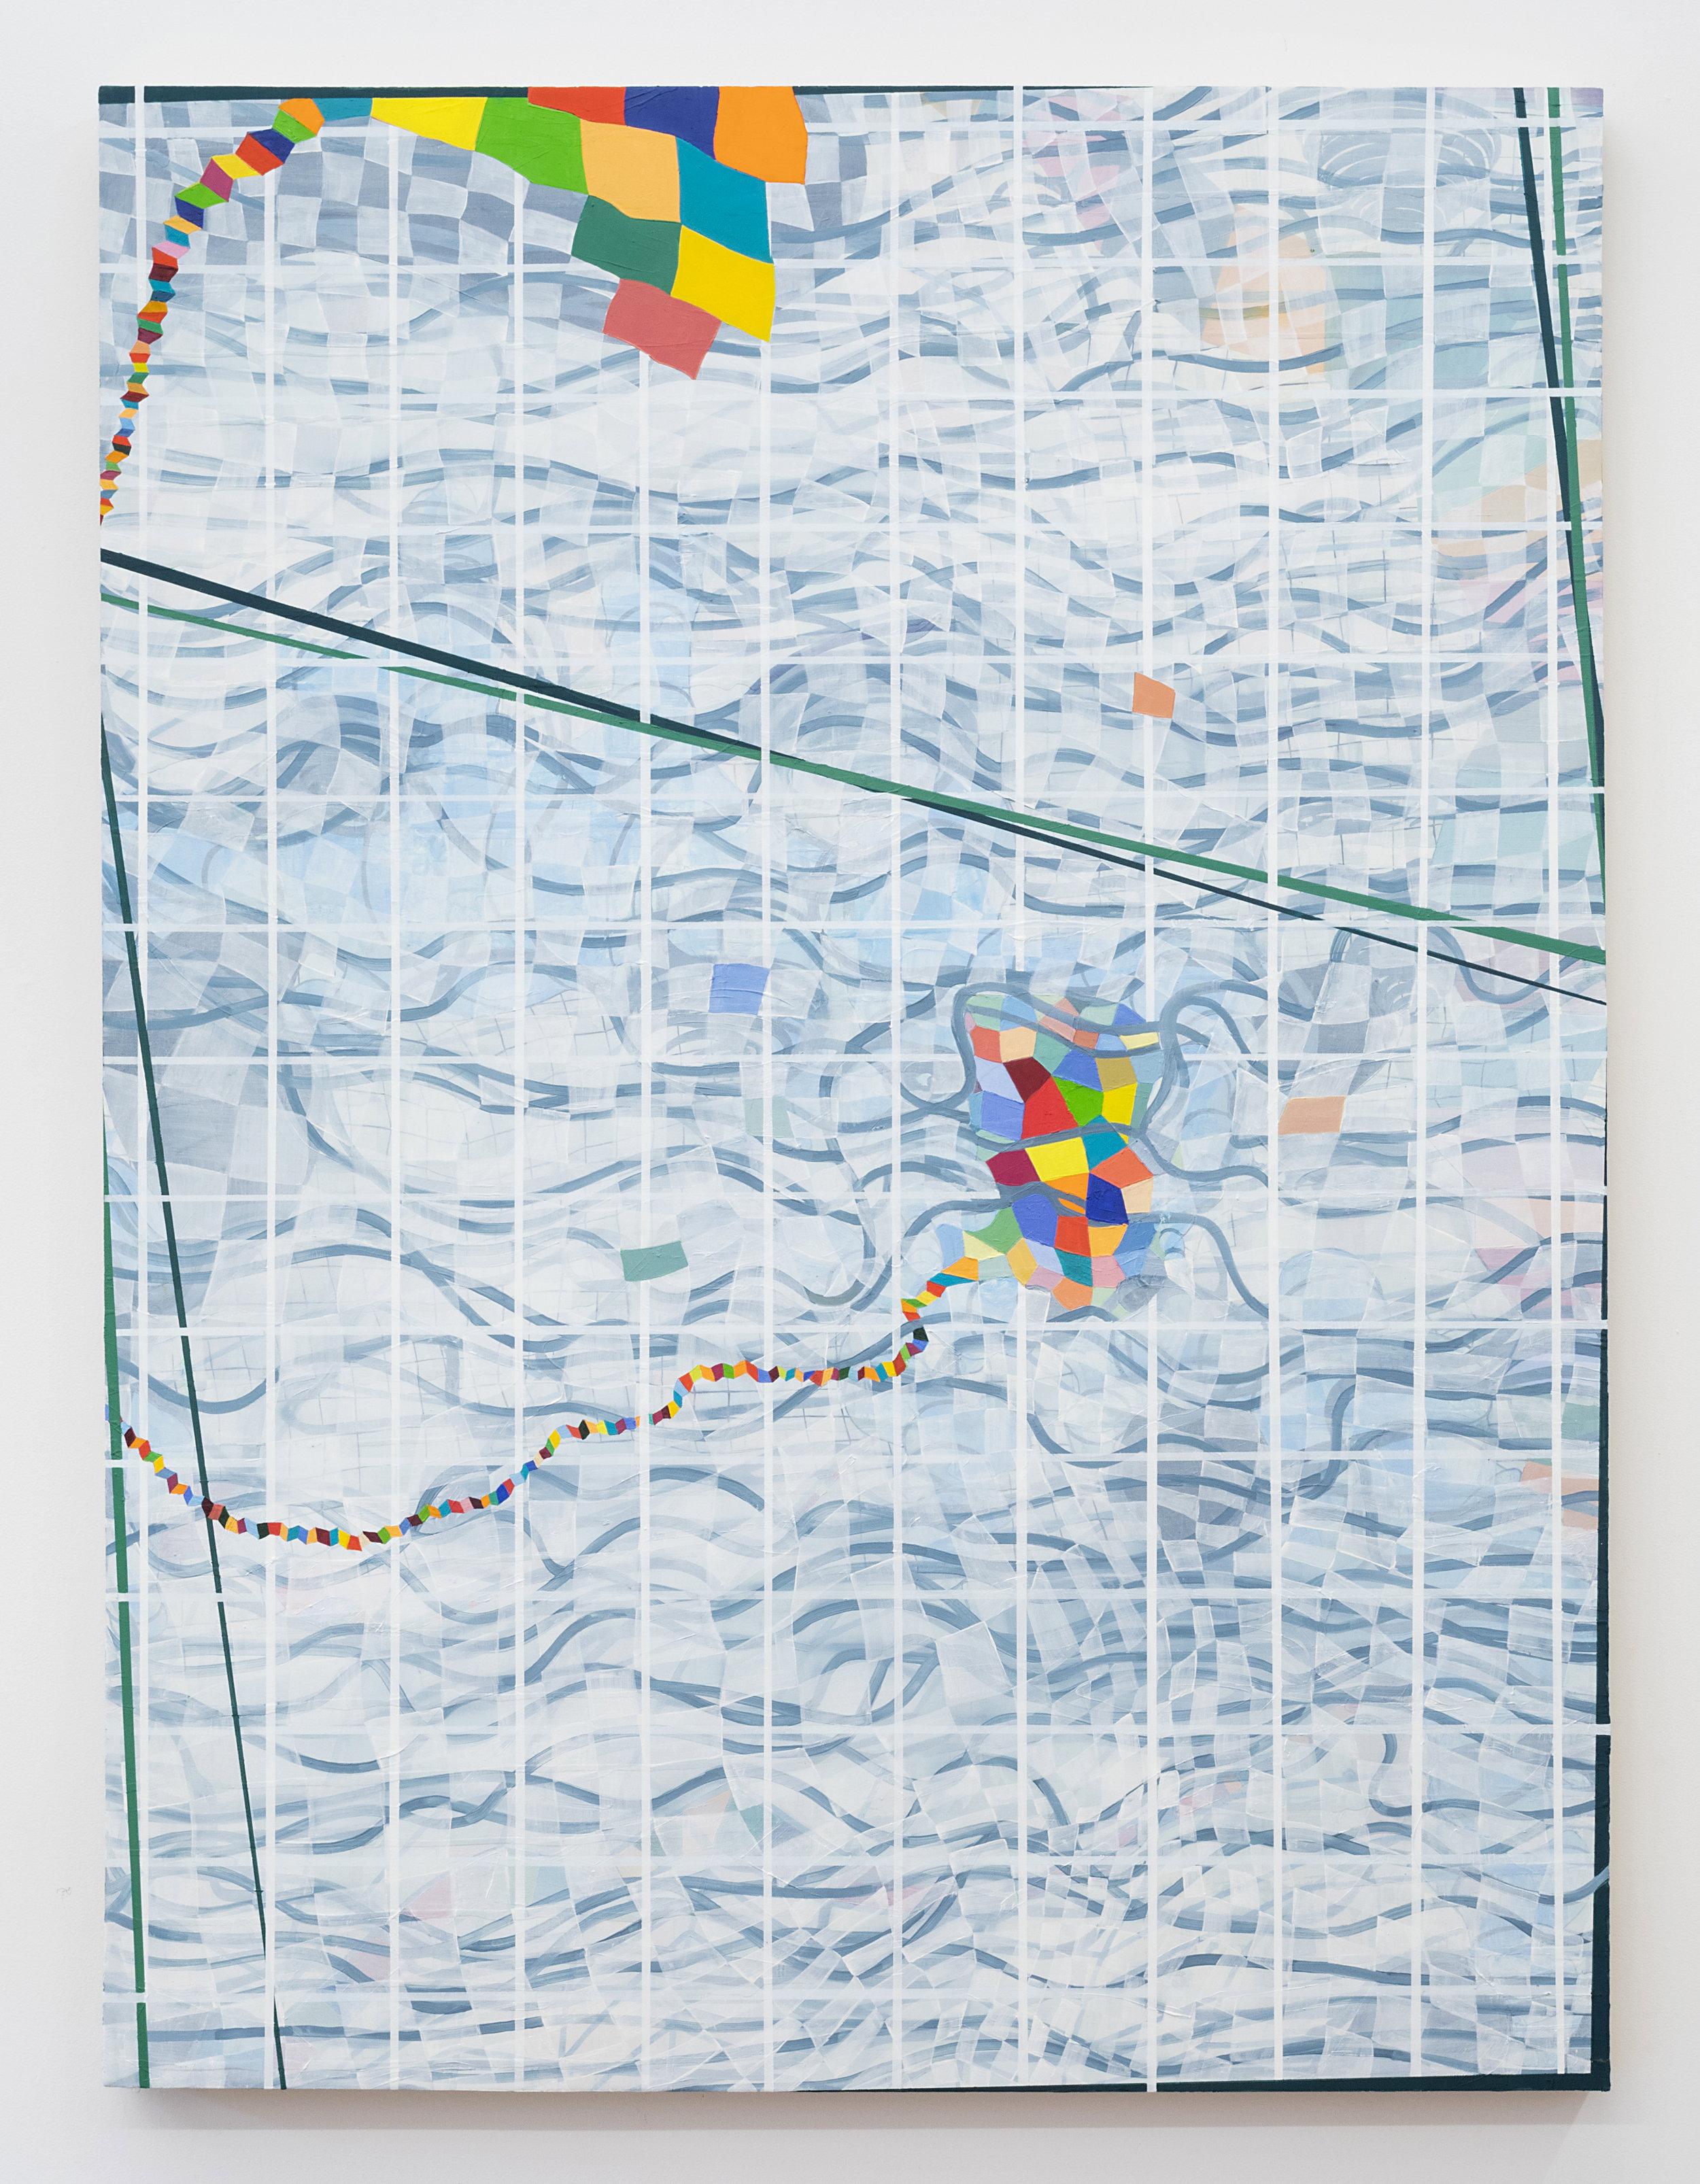 Lisa Corinne Davis  Phantasmal Placement  2018 Oil on canvas 48 x 36 inches